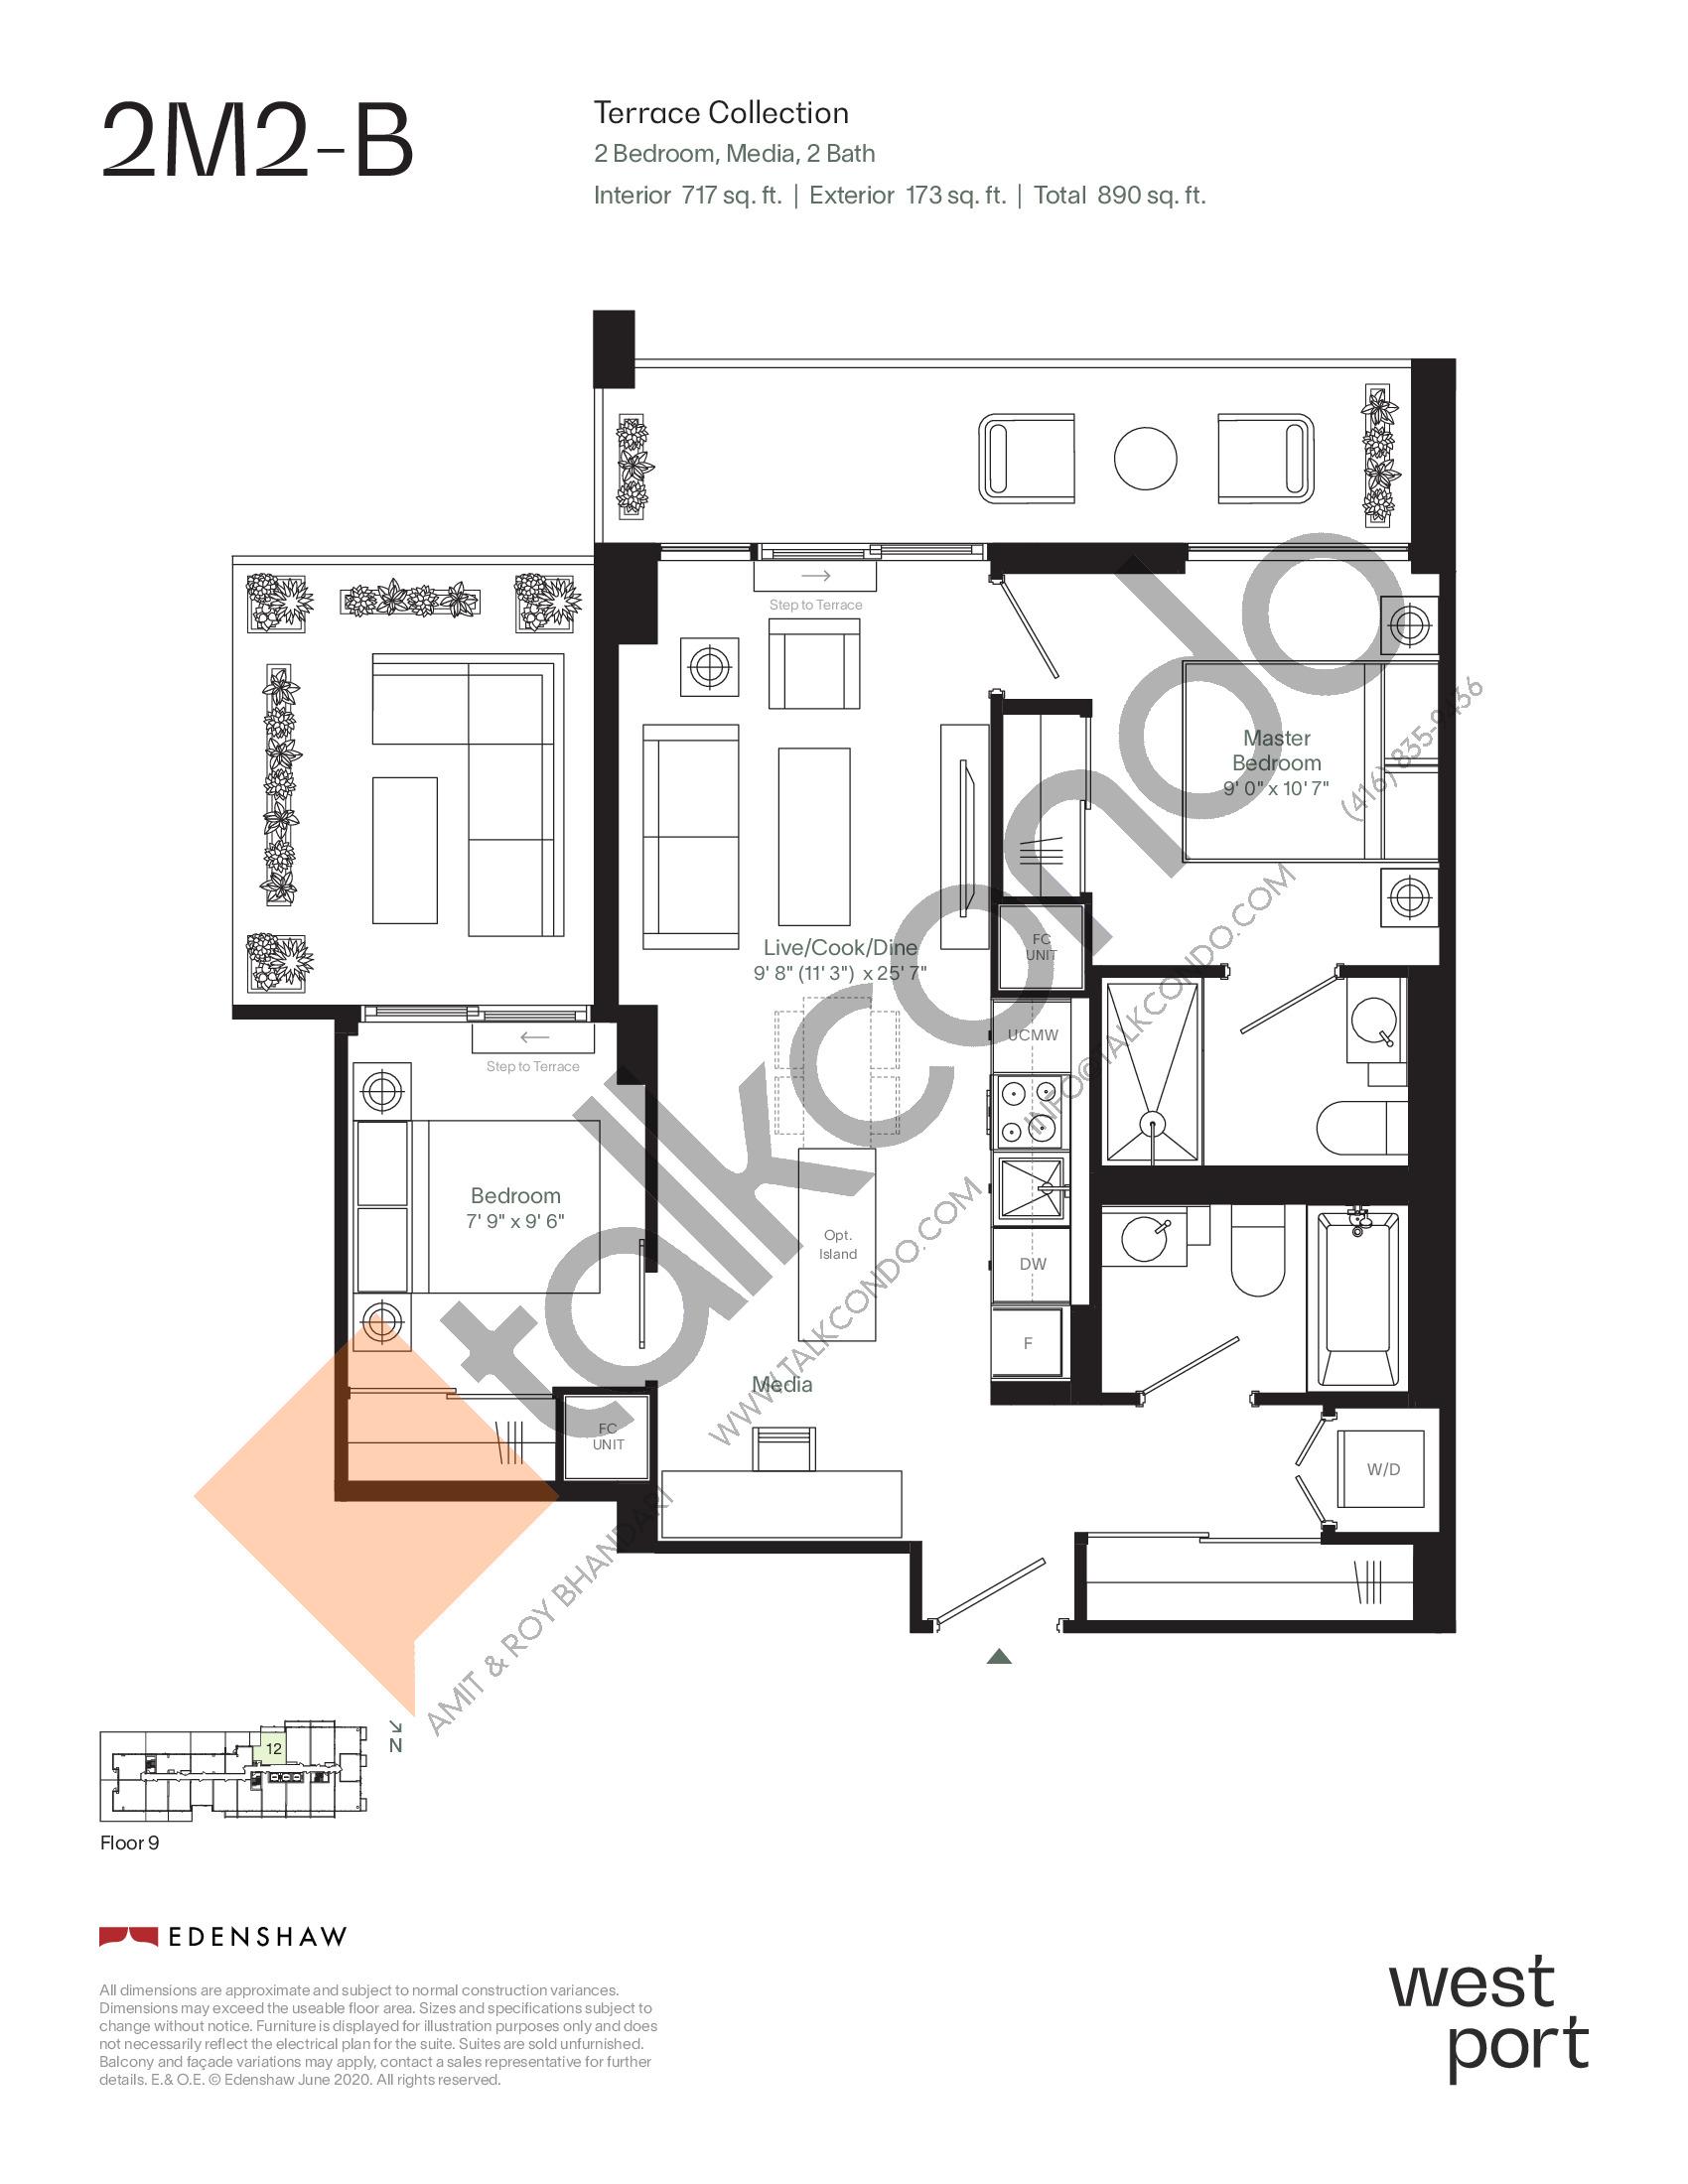 2M2-B - Terrace Collection Floor Plan at Westport Condos - 717 sq.ft